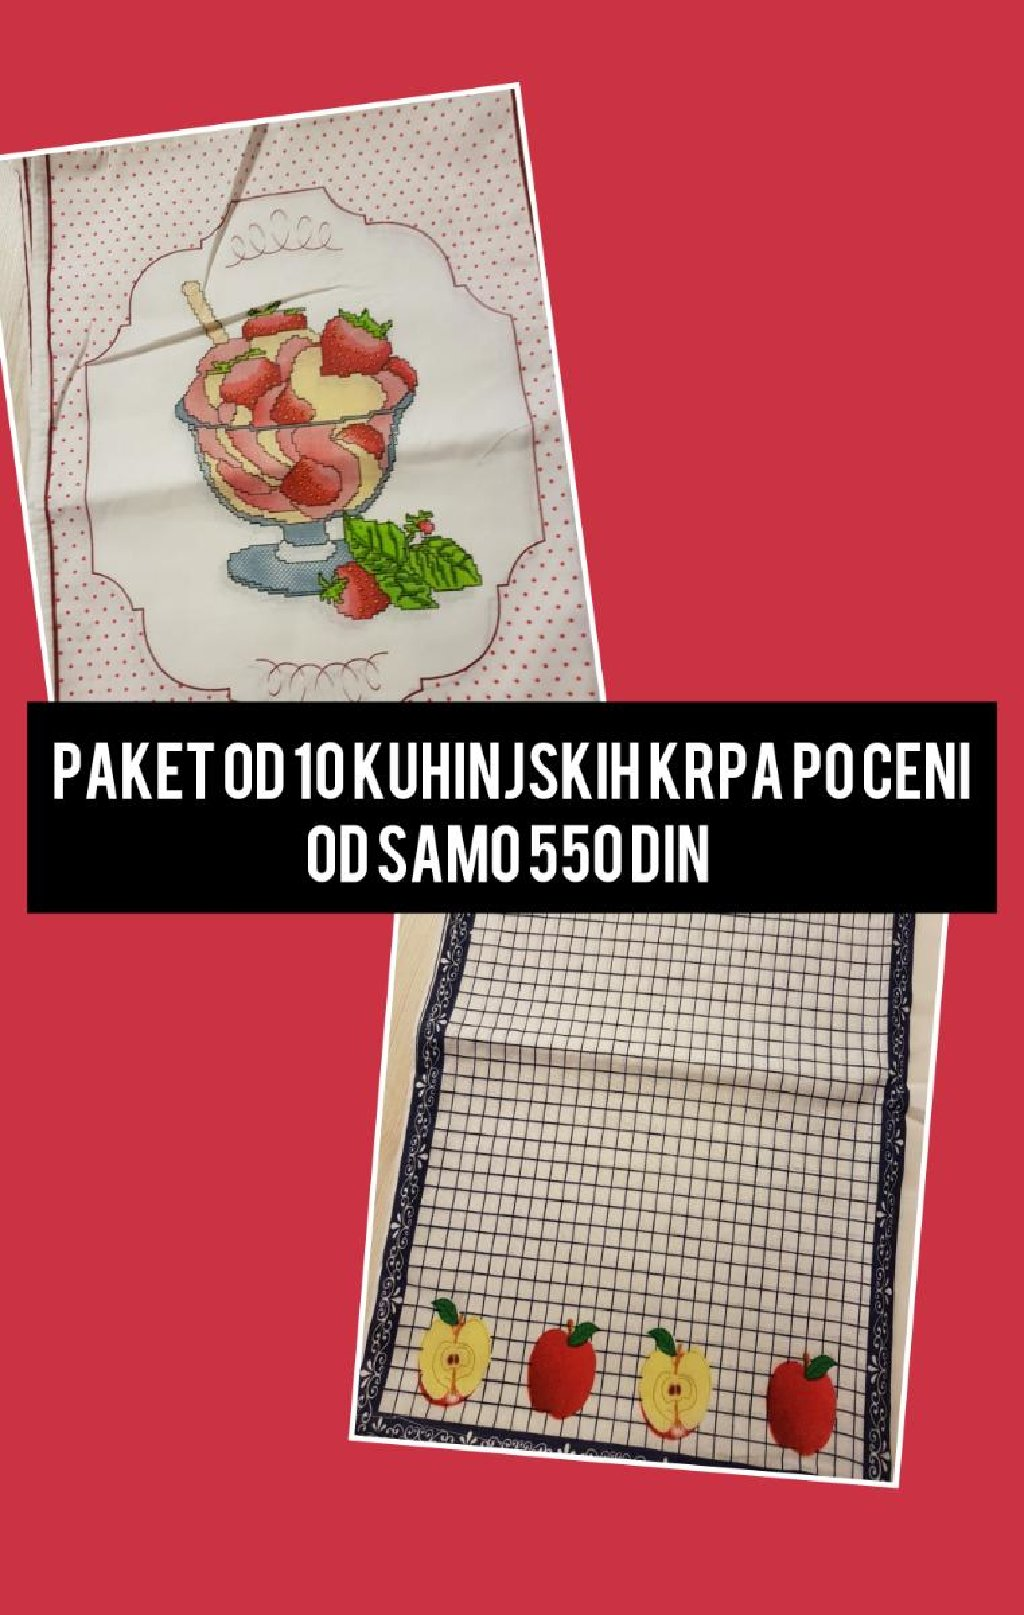 Paket od 10 kuhinjskih krpa po ceni od samo 550 din